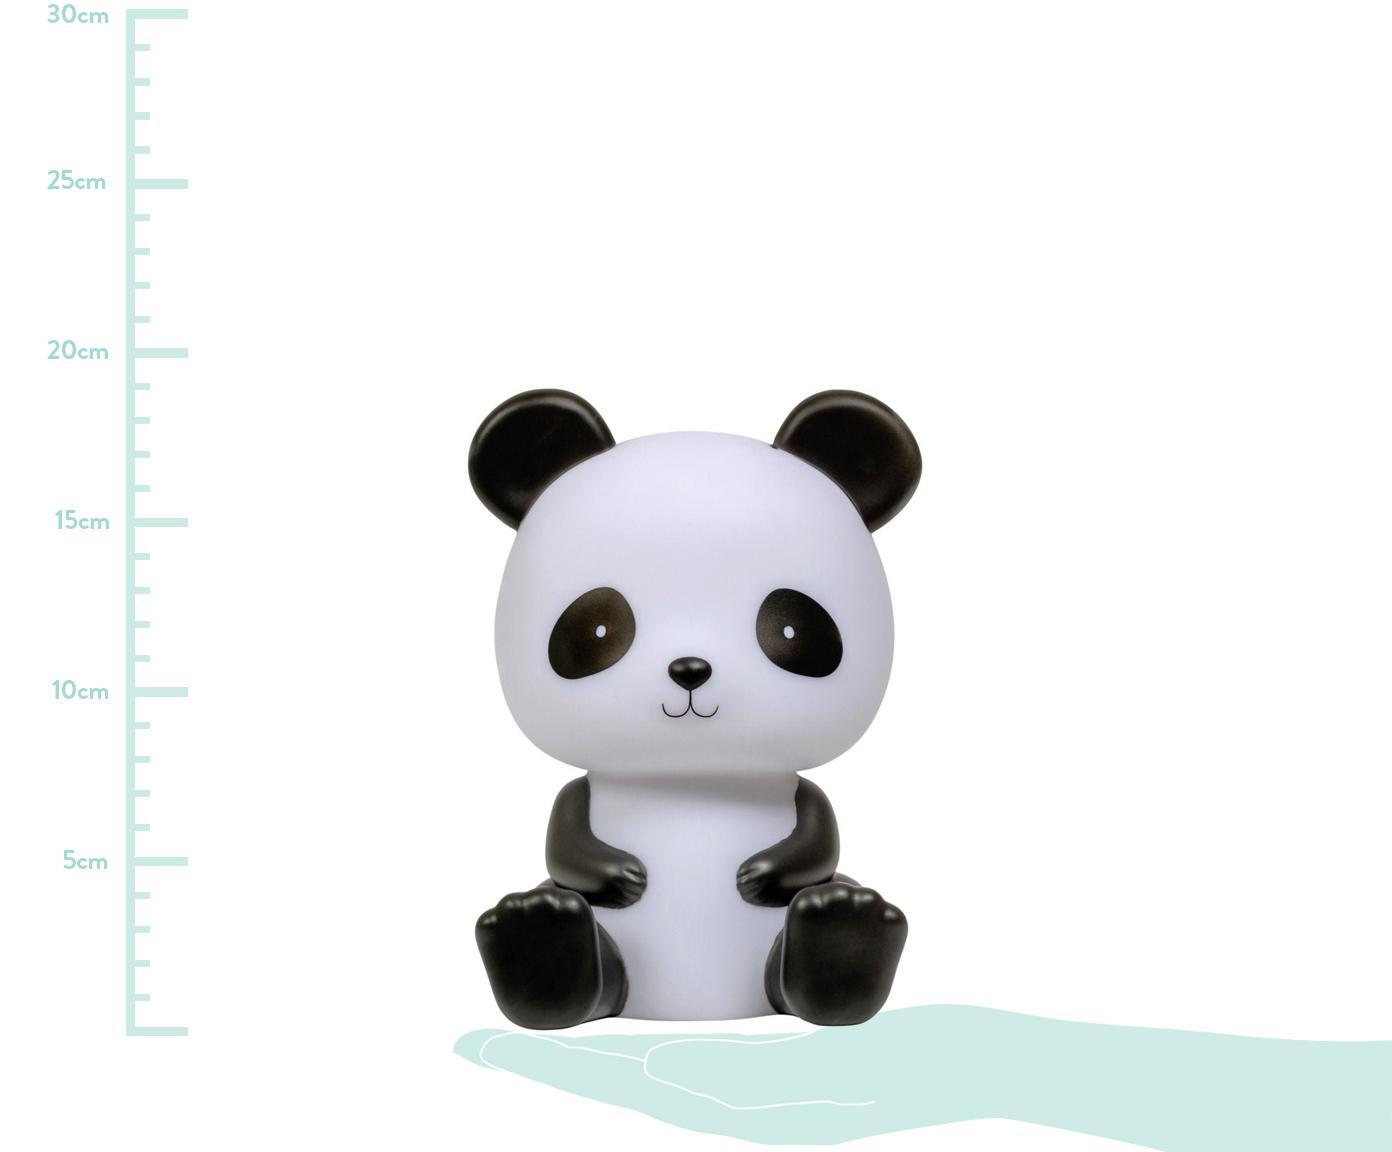 Oggetto luminoso a LED Panda, Senza plastica, BPA, piombo e ftalati, Bianco, nero, Larg. 12 x Alt. 19 cm